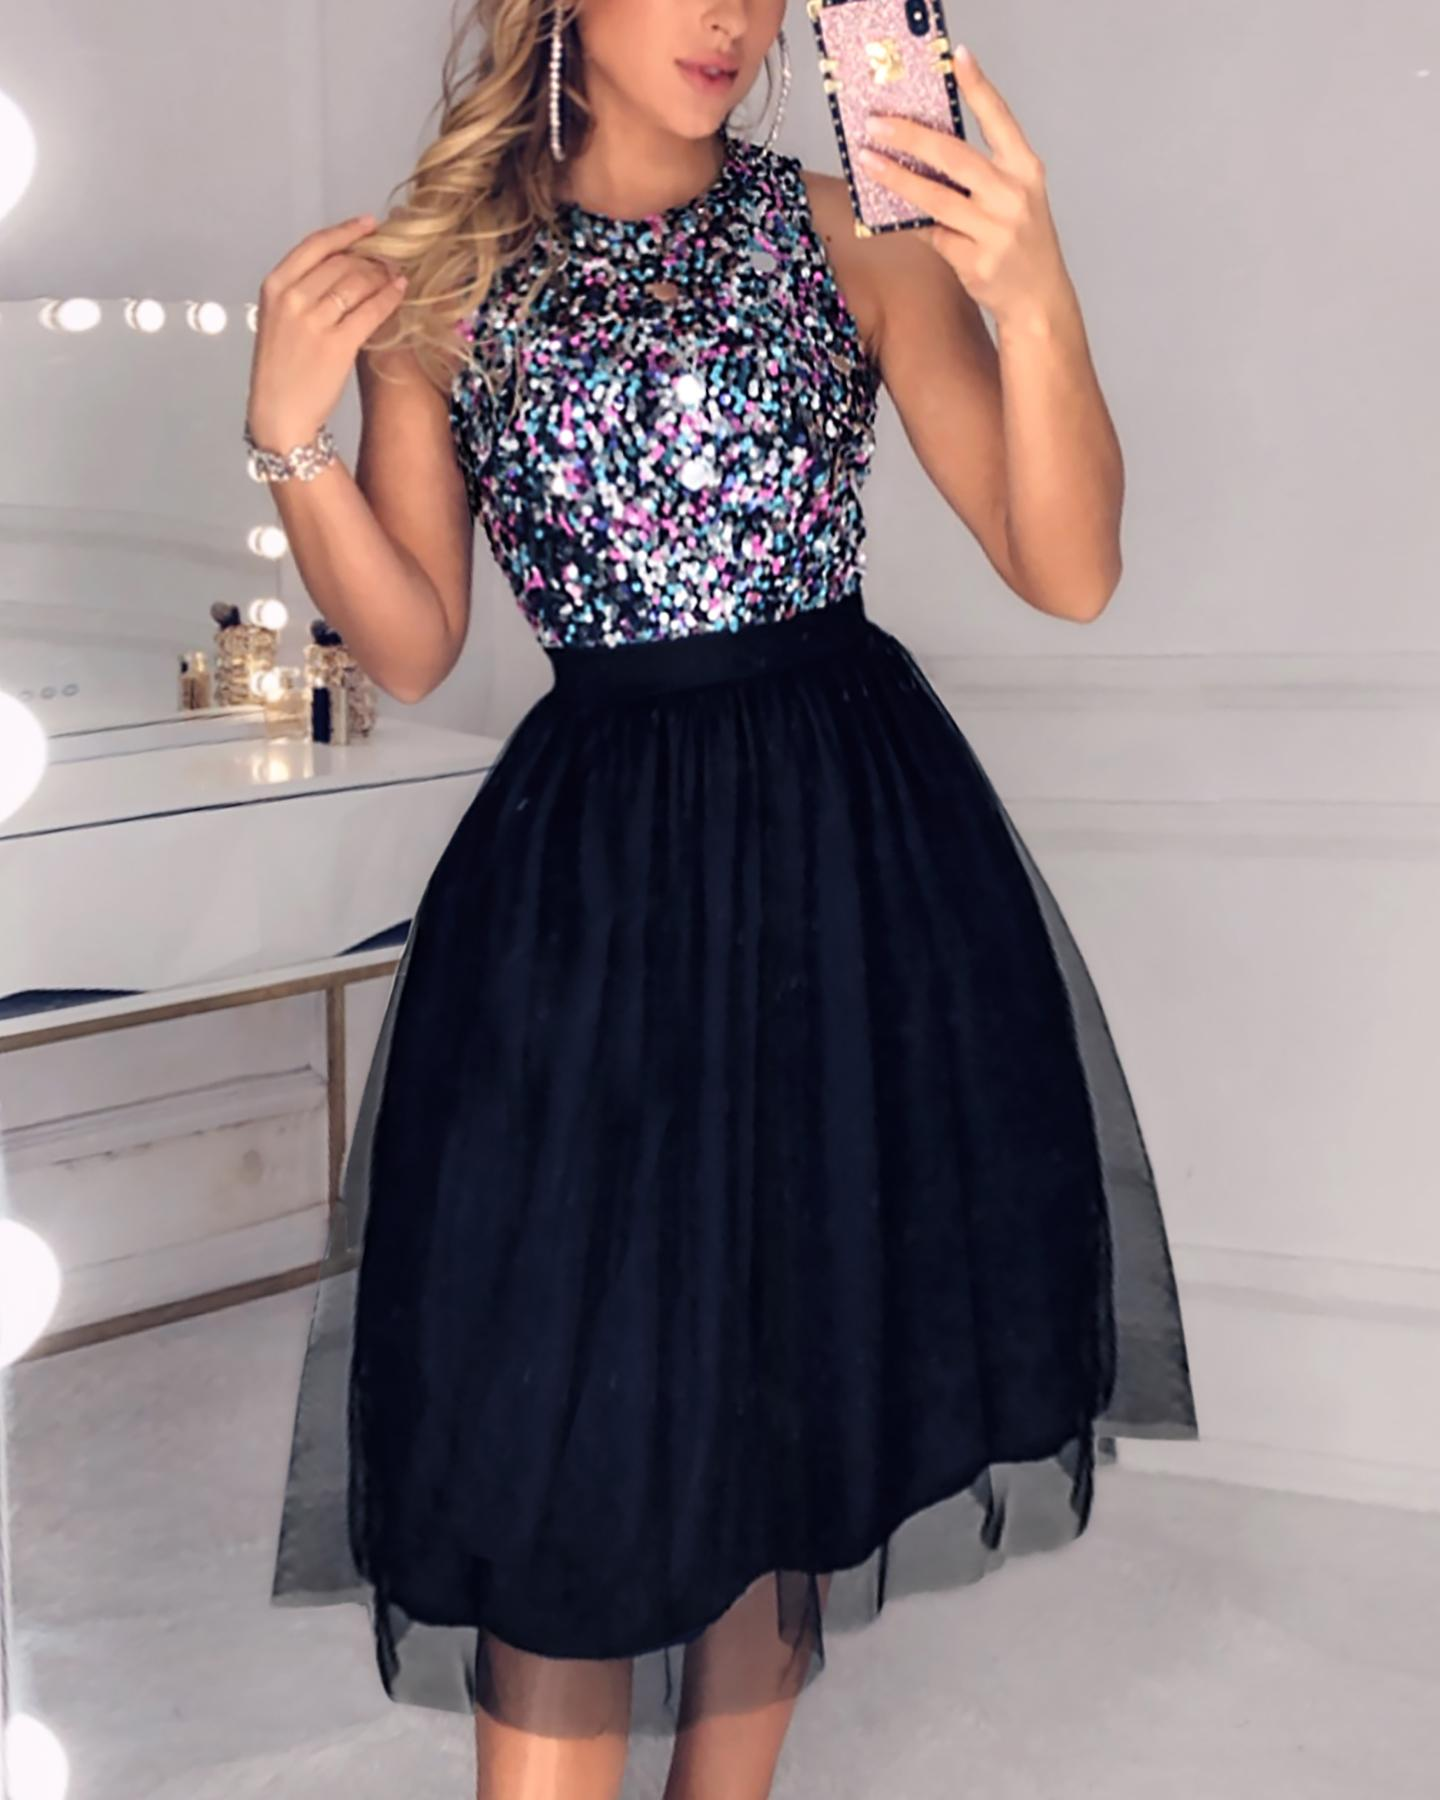 Sleeveless Sequins Colorblock Mesh Insert Ruffles Ruched Dress фото